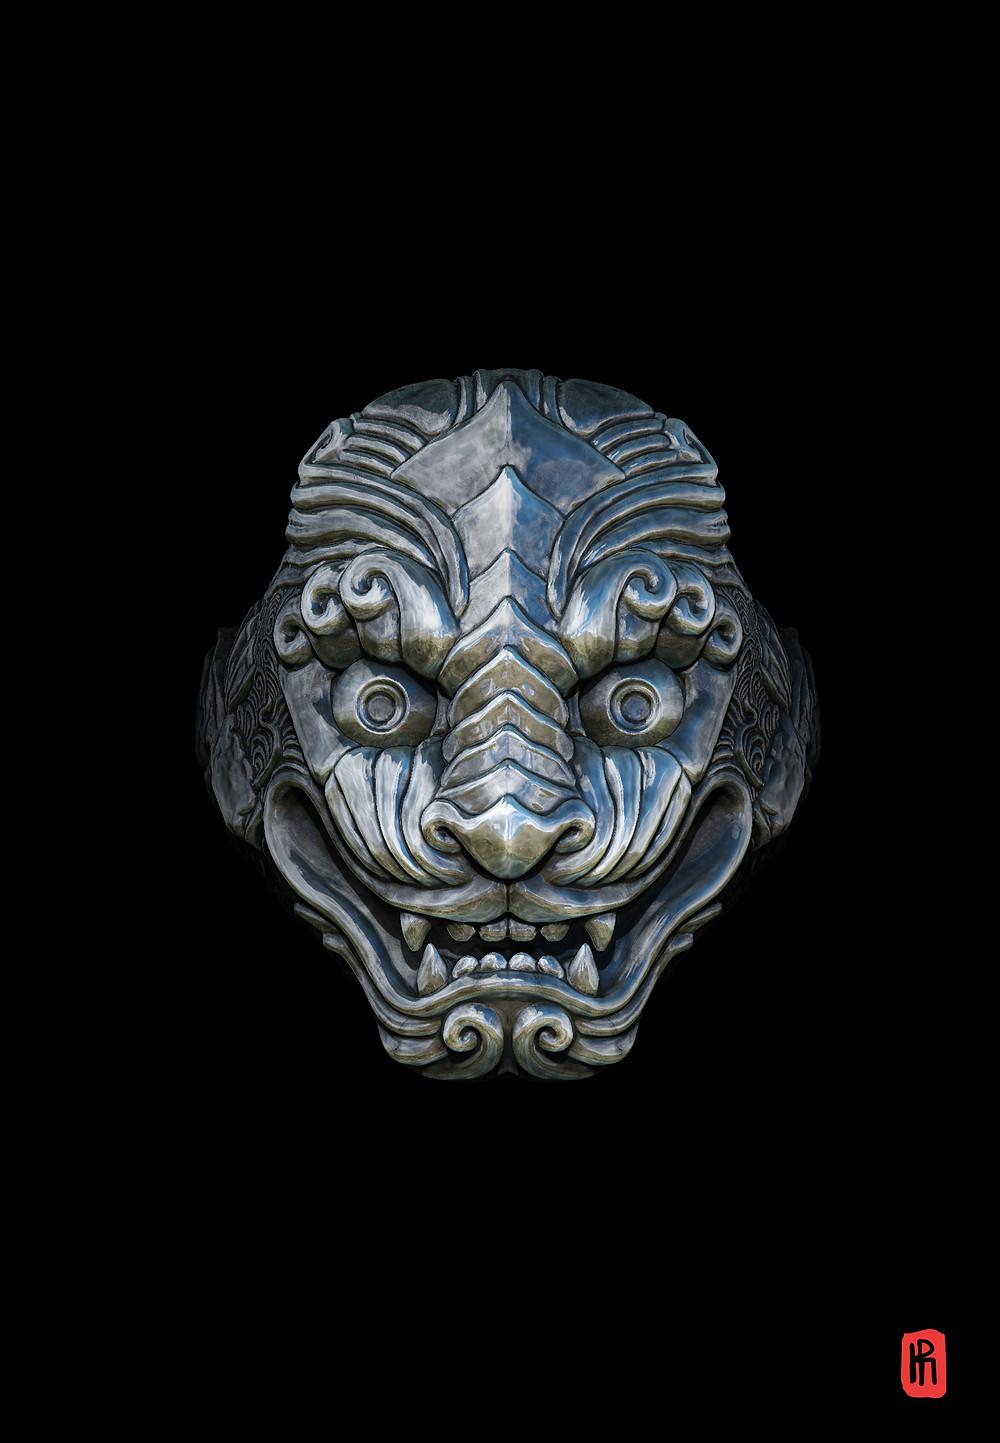 Oni Demon, ZBrush Genève, HRjewelry, Bijoux Homme, Zbrush